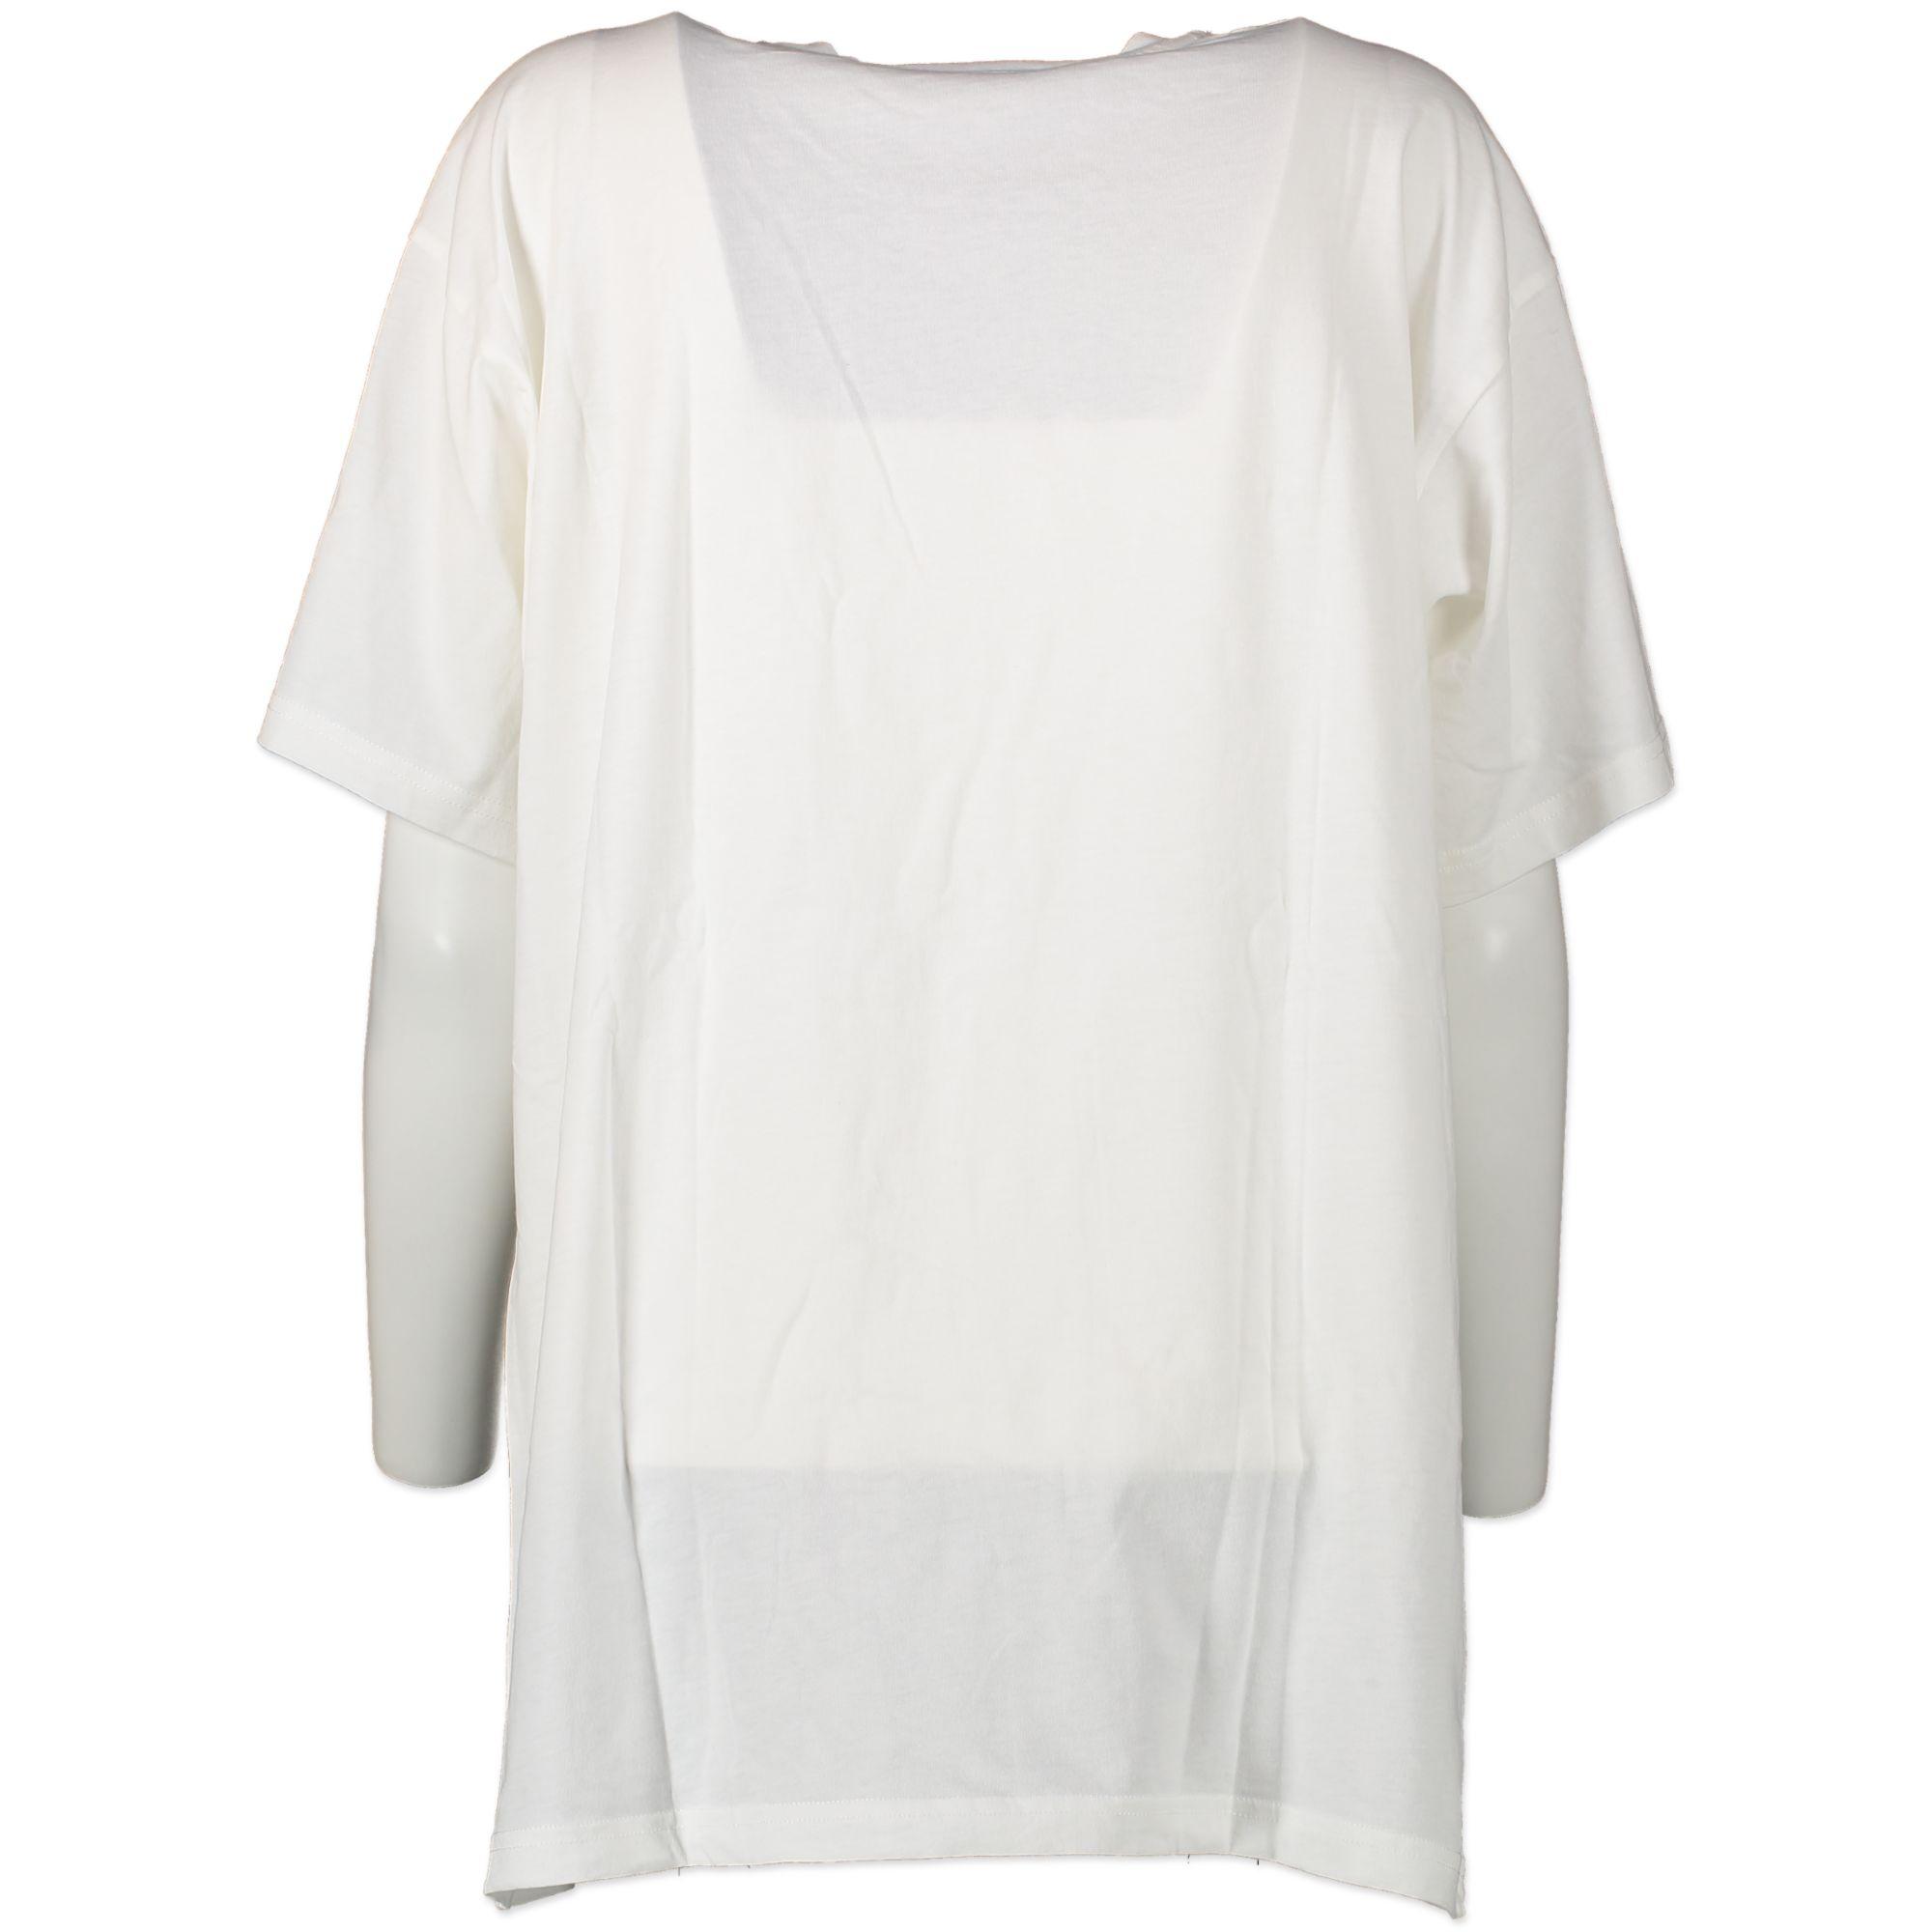 Authentieke Tweedehands Moschino White 'This Is Not A Moschino T-Shirt' Shirt - Size M juiste prijs veilig online shoppen luxe merken webshop winkelen Antwerpen België mode fashion